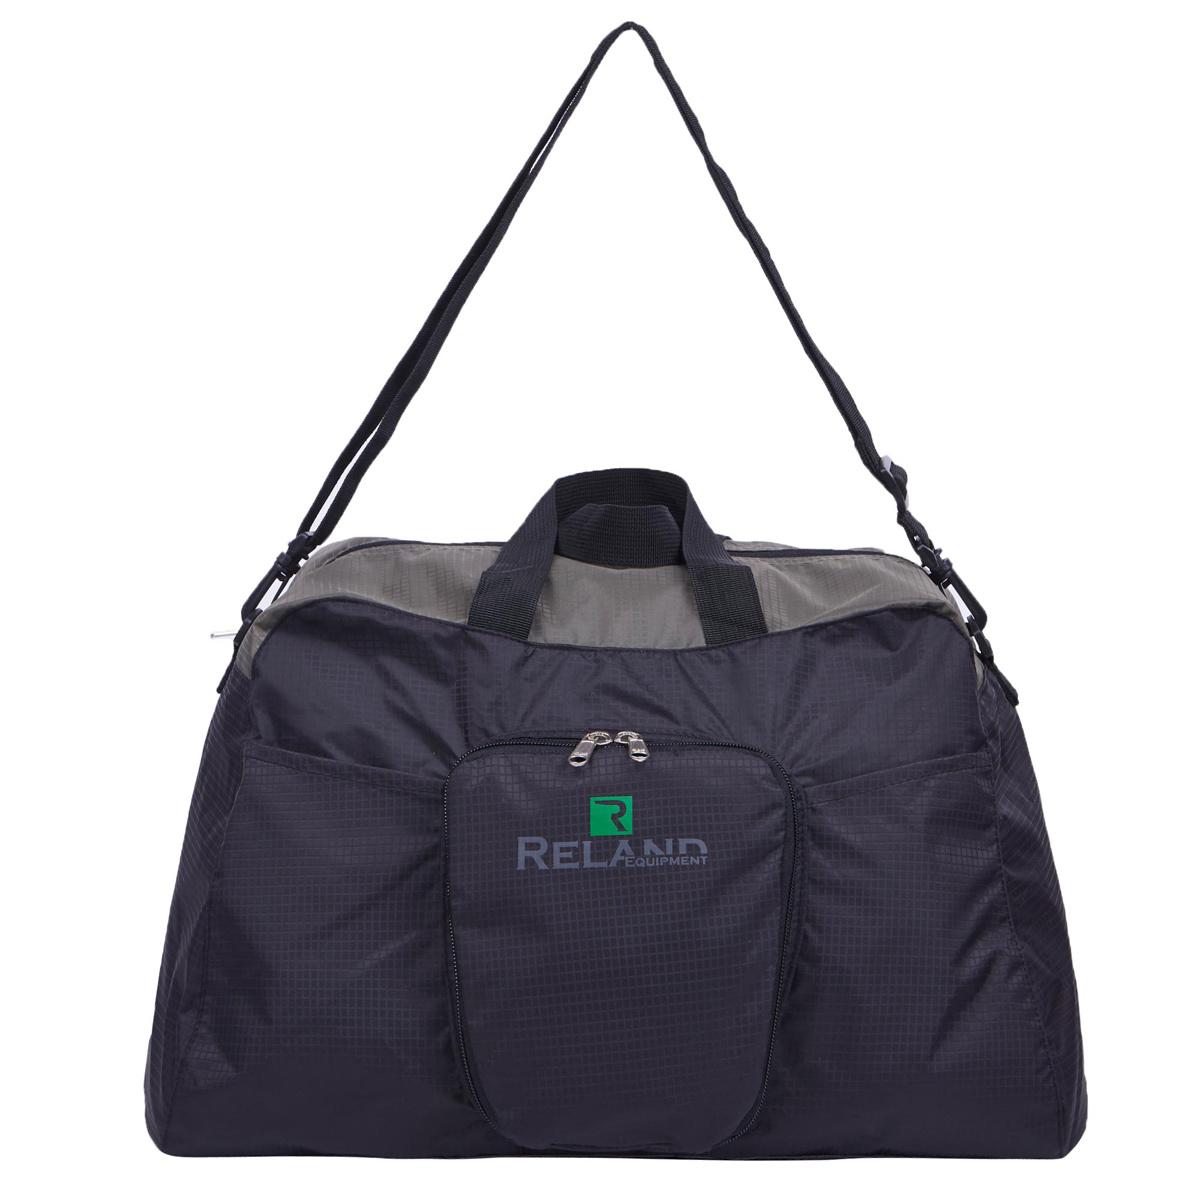 Travel Luggage Duffle Bag Lightweight Portable Handbag Umbrella Print Large Capacity Waterproof Foldable Storage Tote